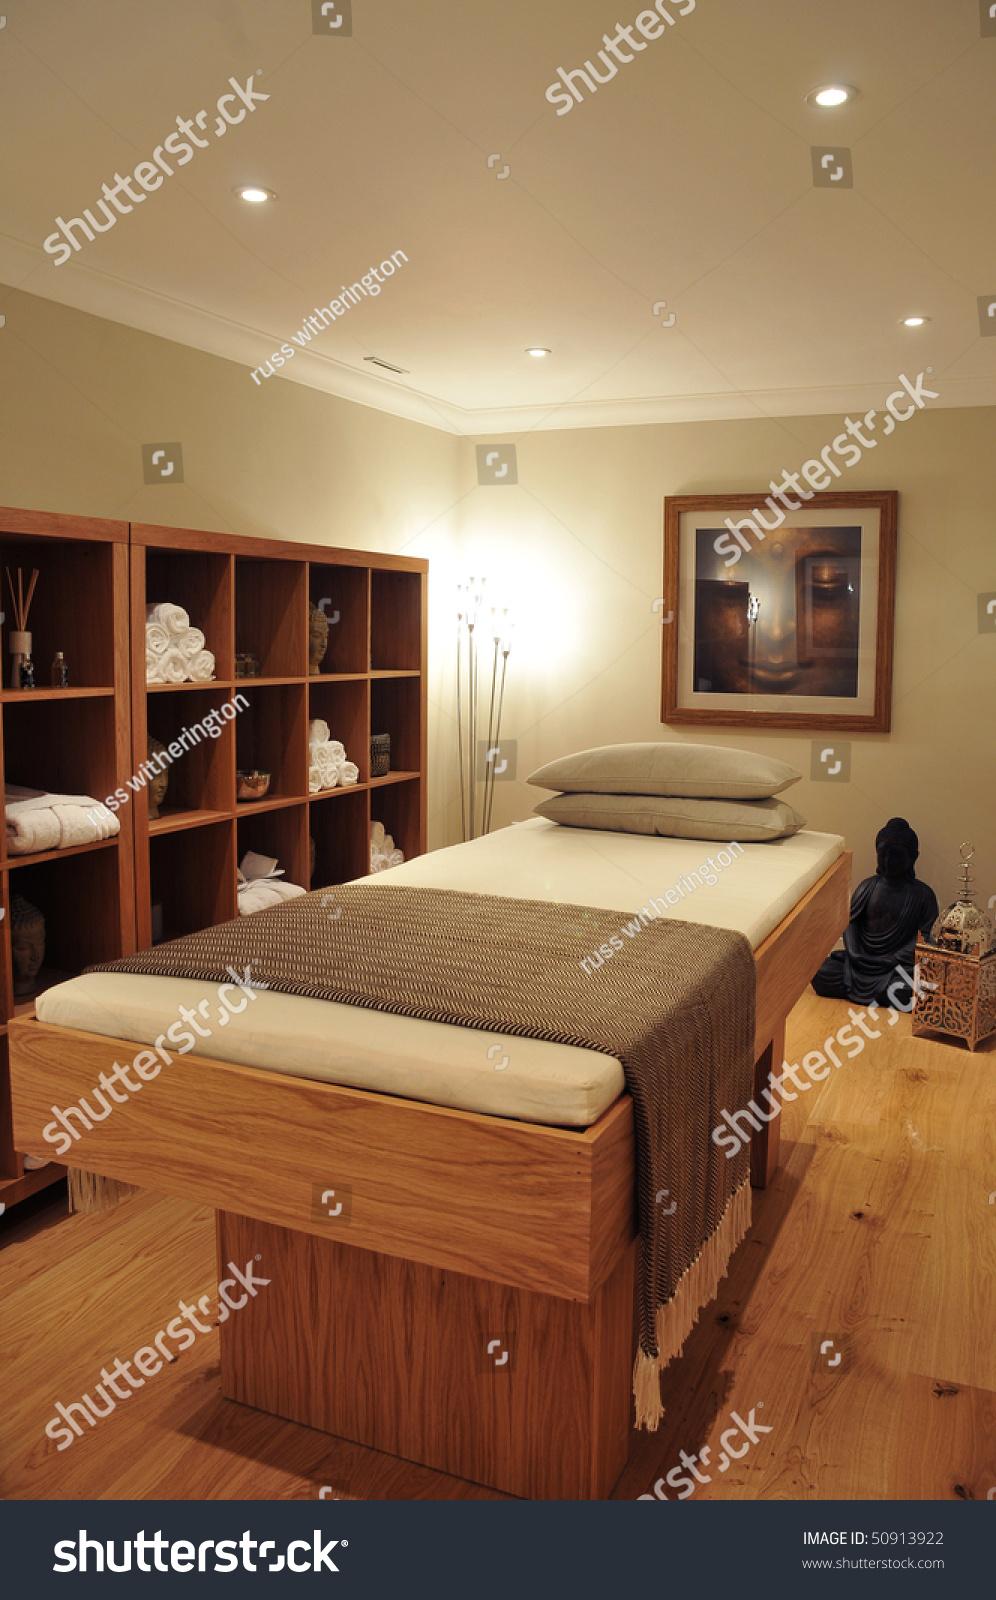 Groovy Interior Spa Room Consisting Bench Pillows Stock Photo Edit Uwap Interior Chair Design Uwaporg